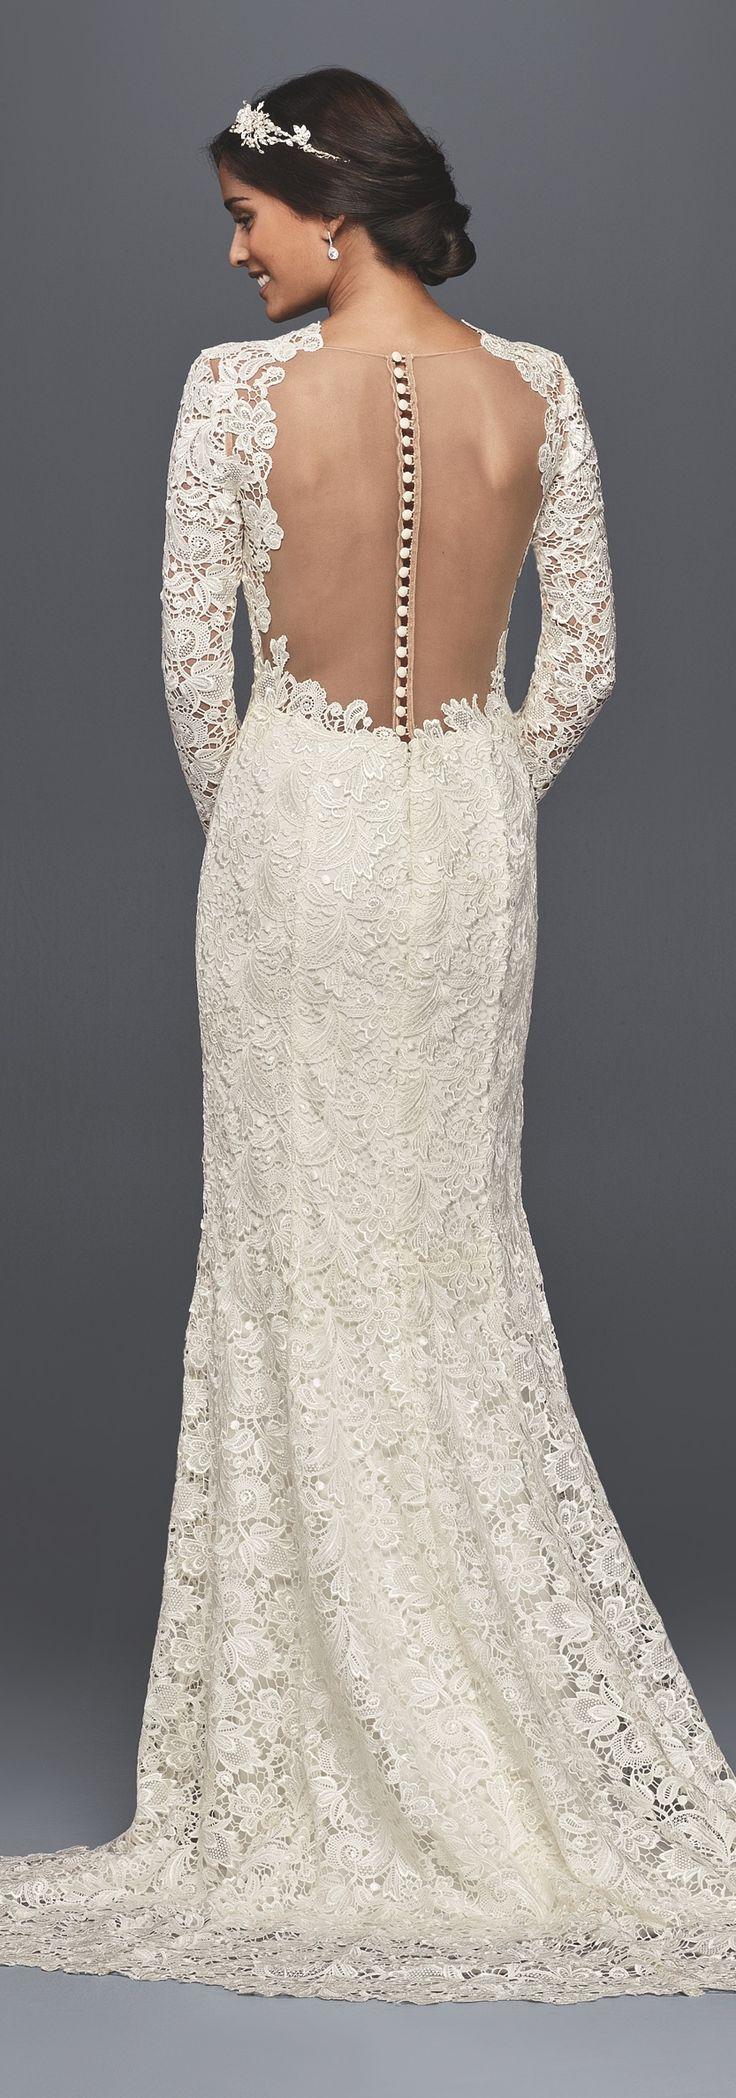 Long Sleeve Lace Wedding Dress with Open Back | David's Bridal Spring 2017  | #davidsbridal #melissasweet